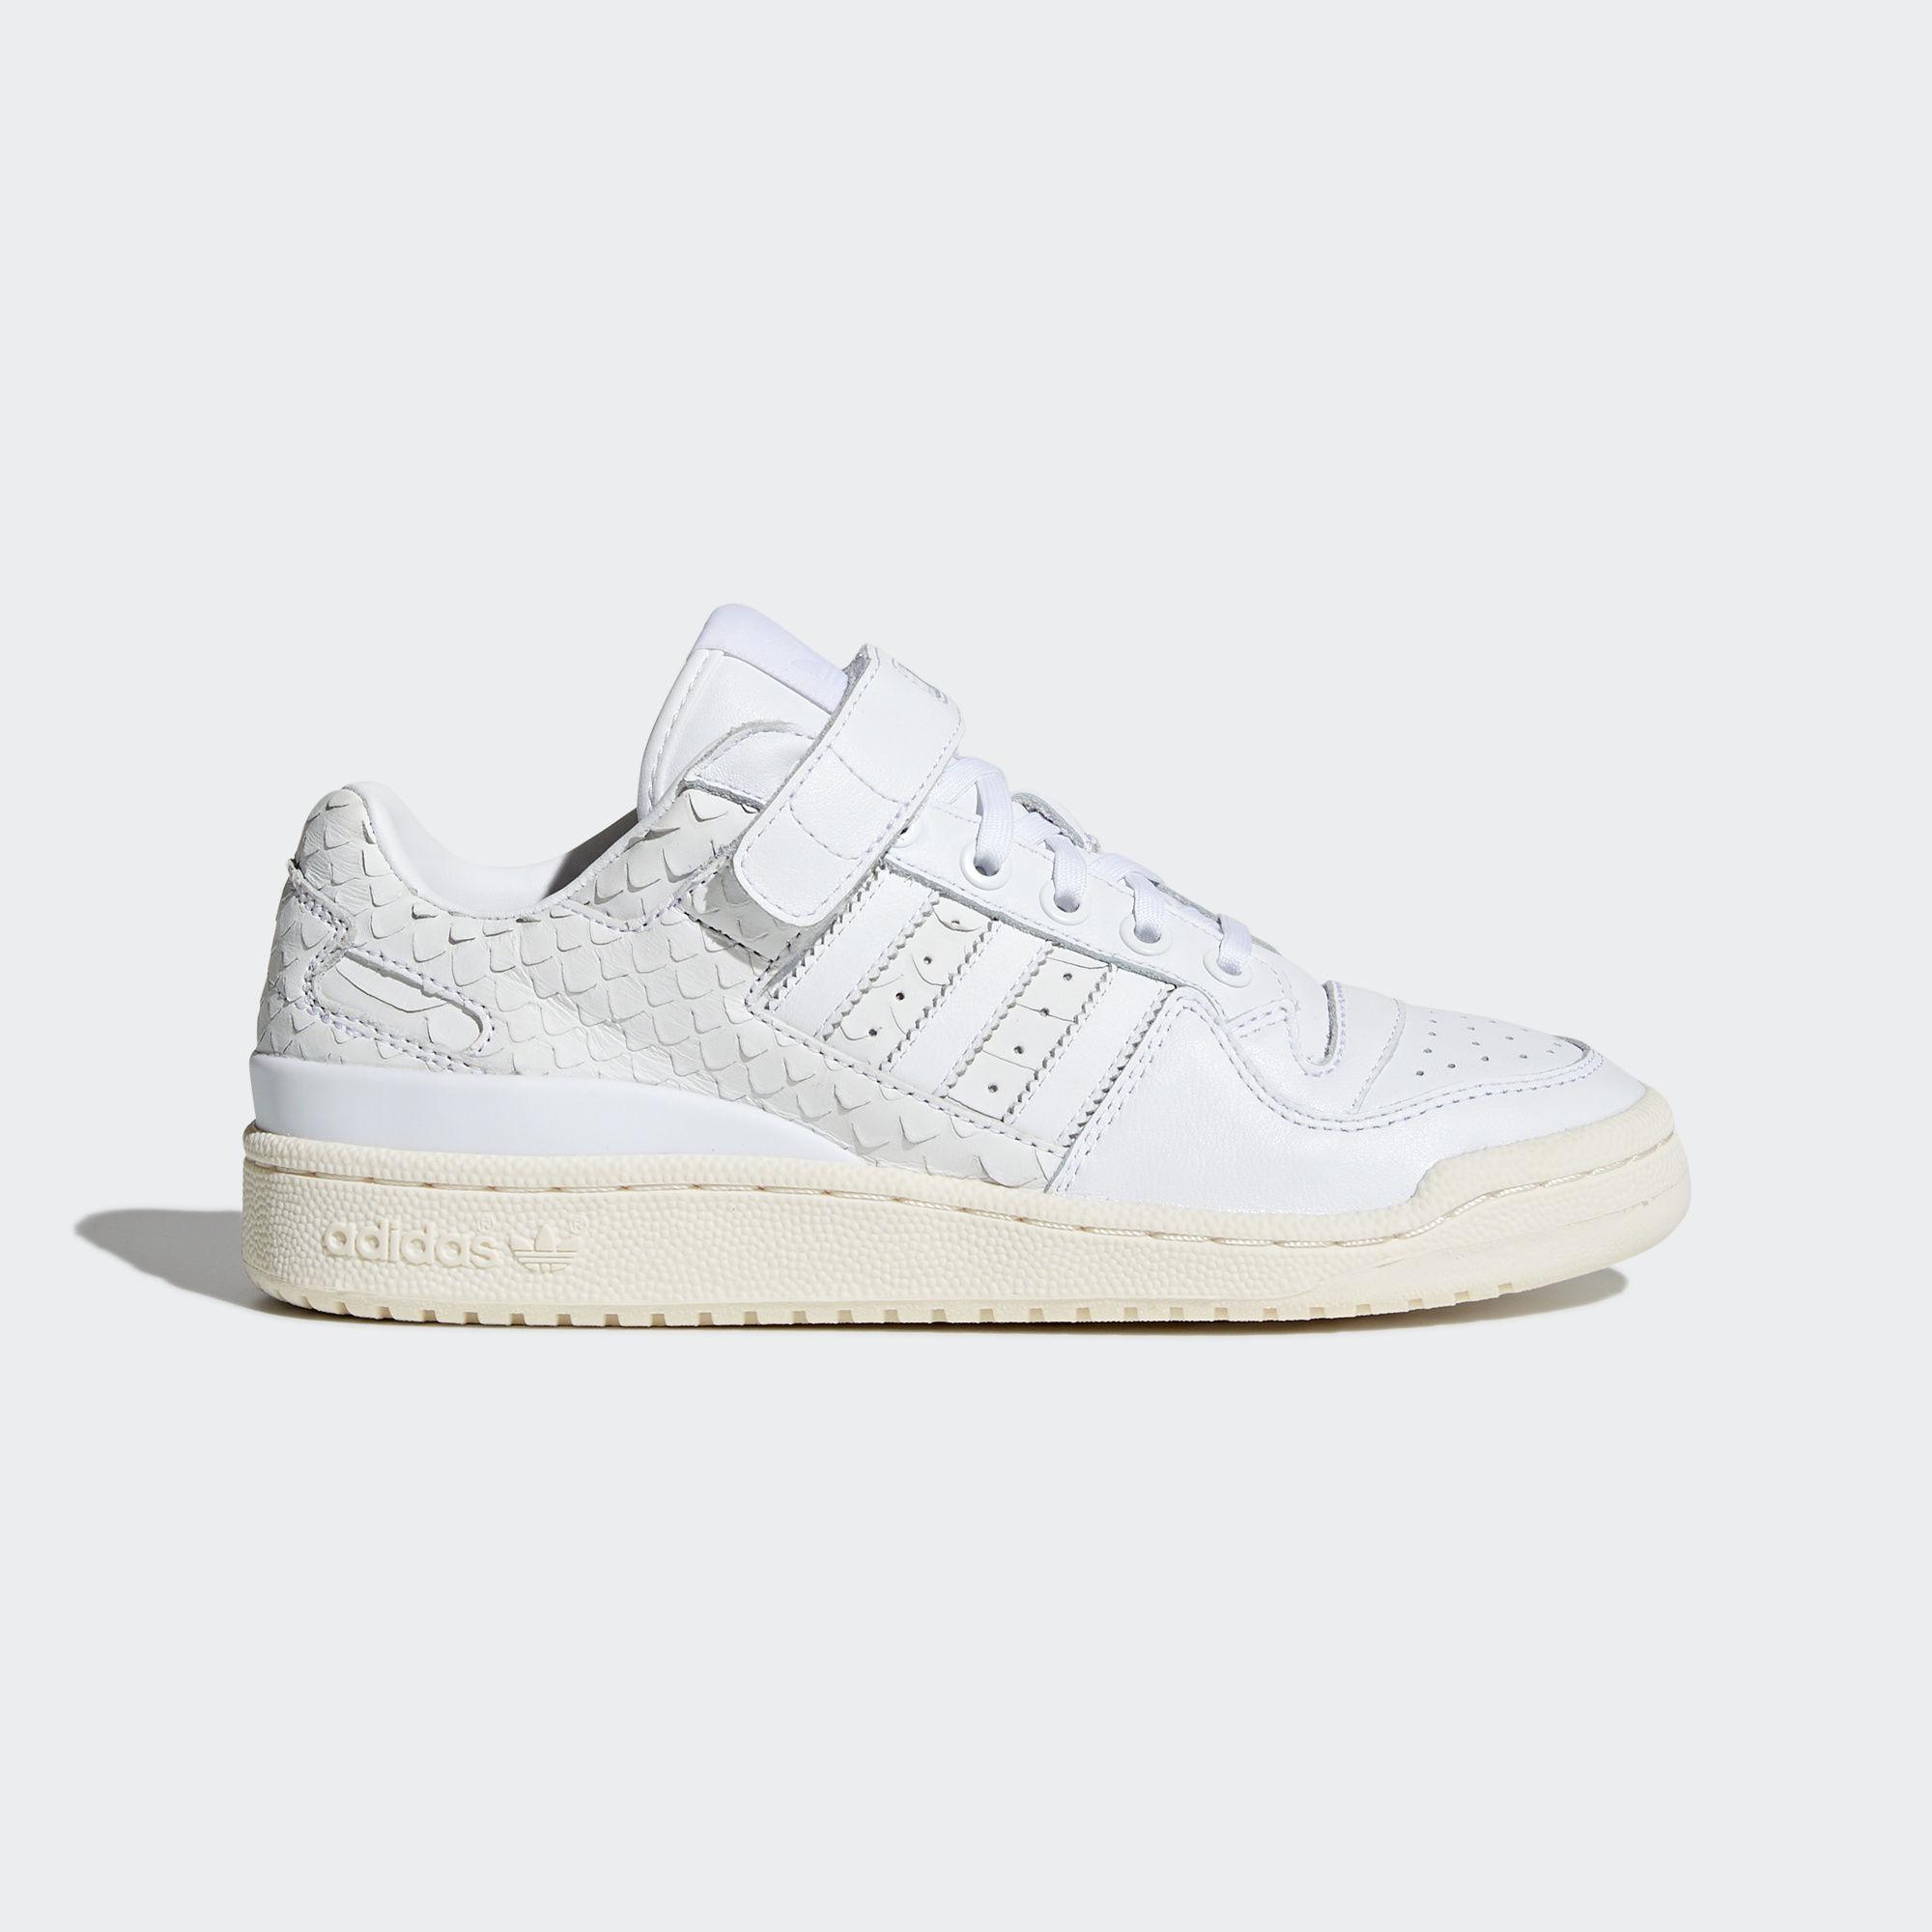 lyst adidas forum basso scarpe bianche